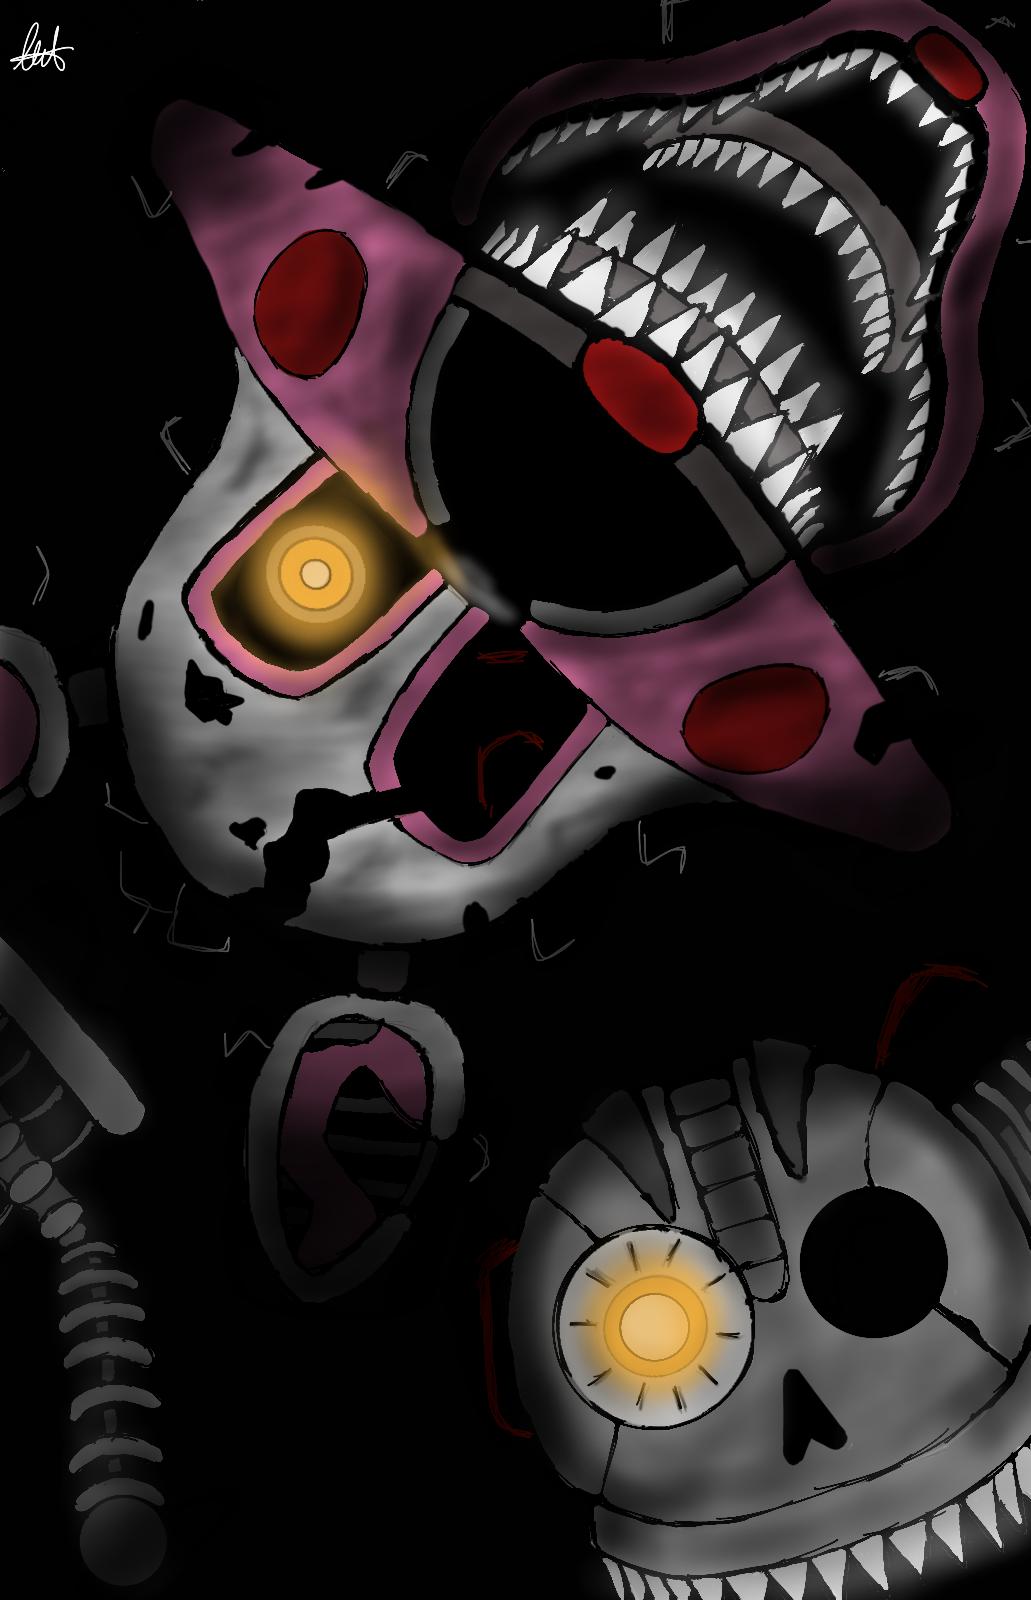 FNAF 4 (Halloween Edition) Nightmare Mangle by RubyRose10 on ...